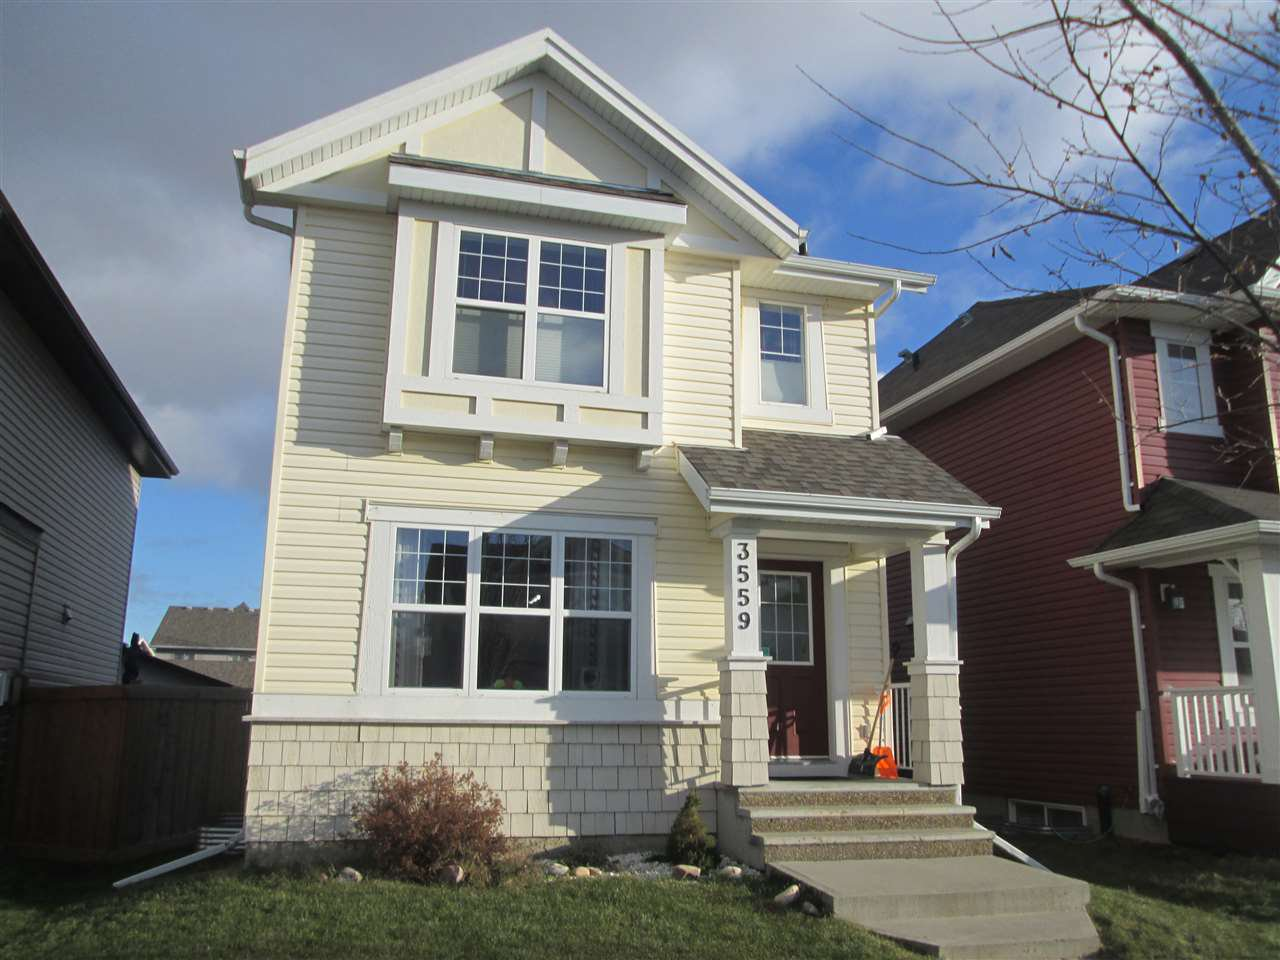 Main Photo: 3559 13 Street in Edmonton: Zone 30 House for sale : MLS®# E4180774